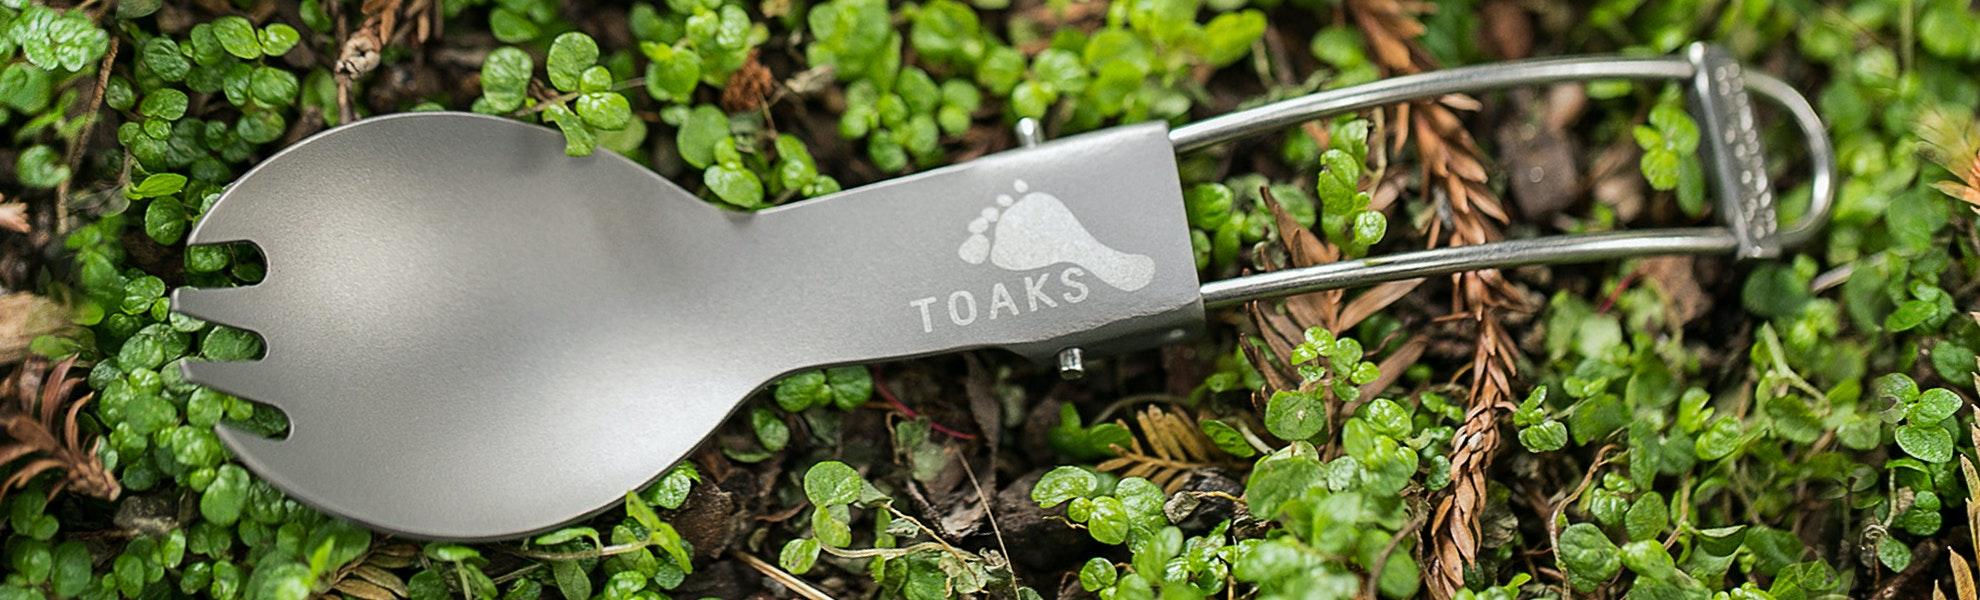 Toaks Titanium Folding Spork (3-pack)